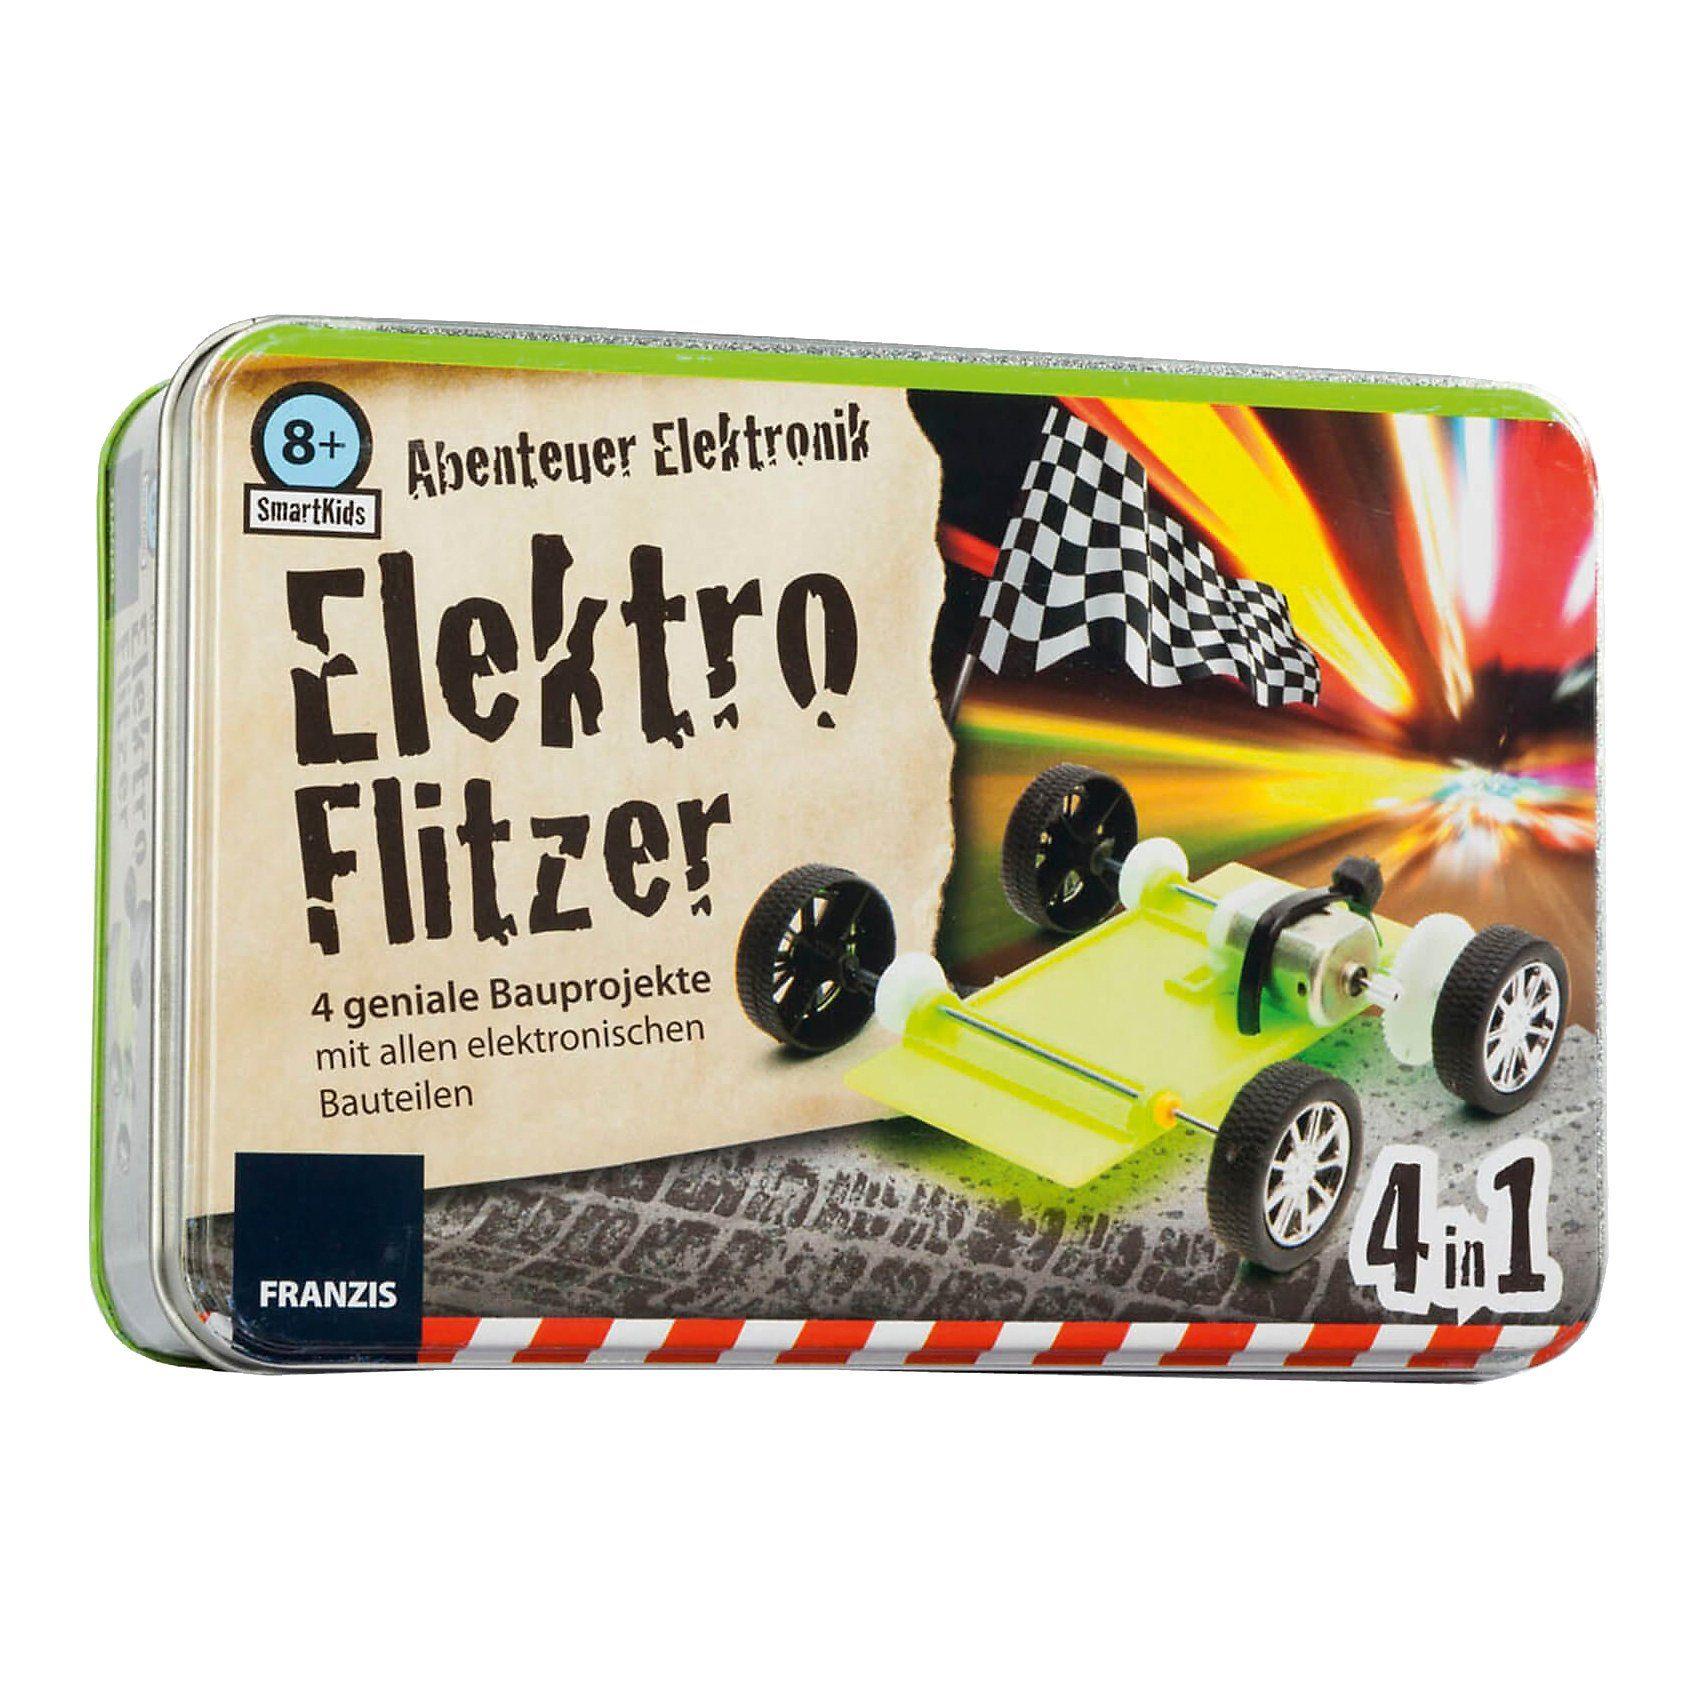 Abenteuer Elektronik - Elektroflitzer